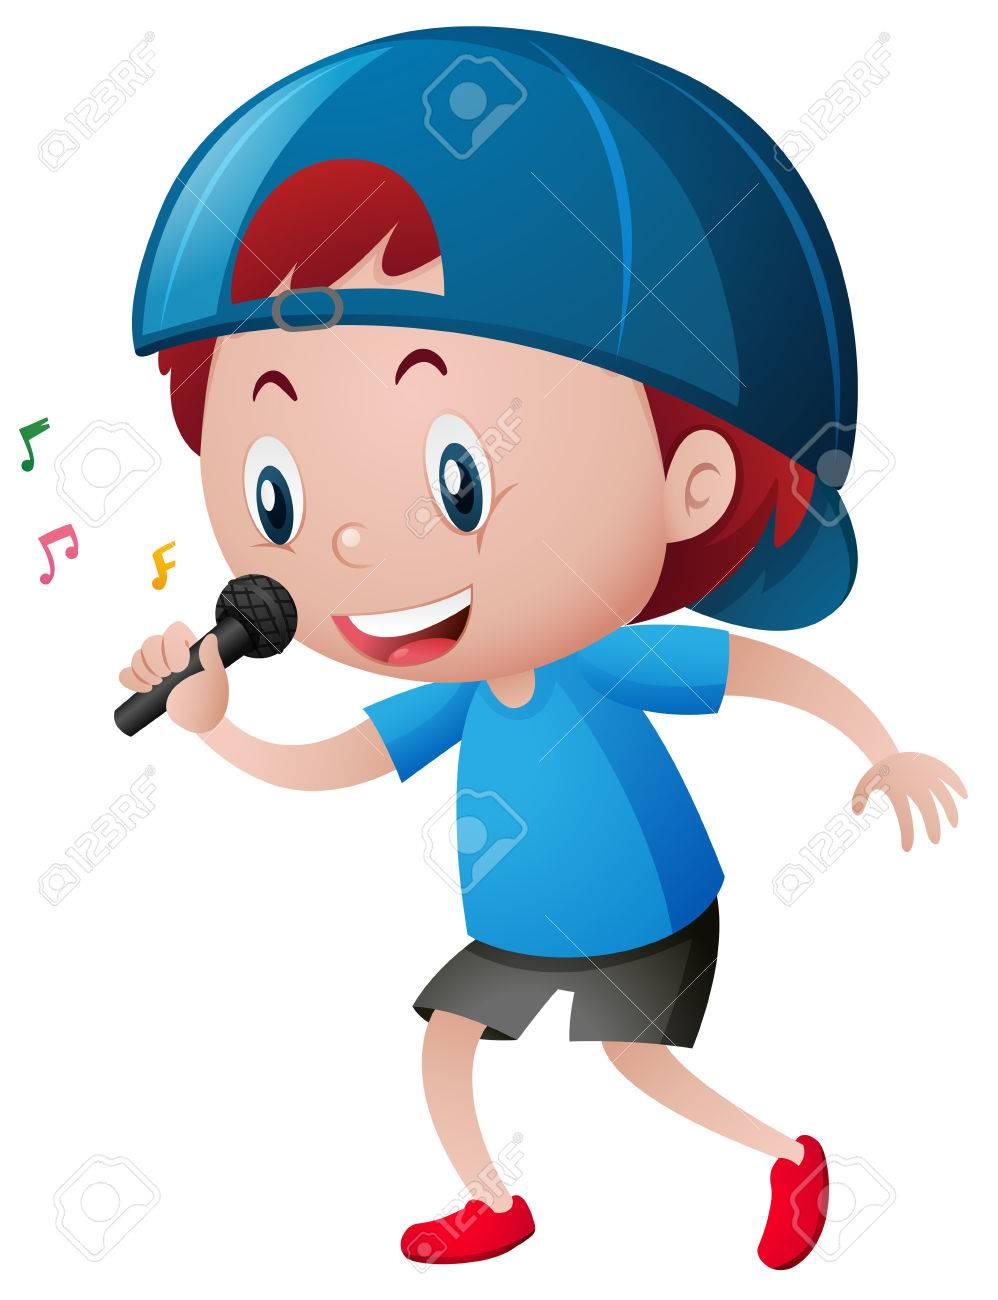 Little boy singing on microphone illustration.